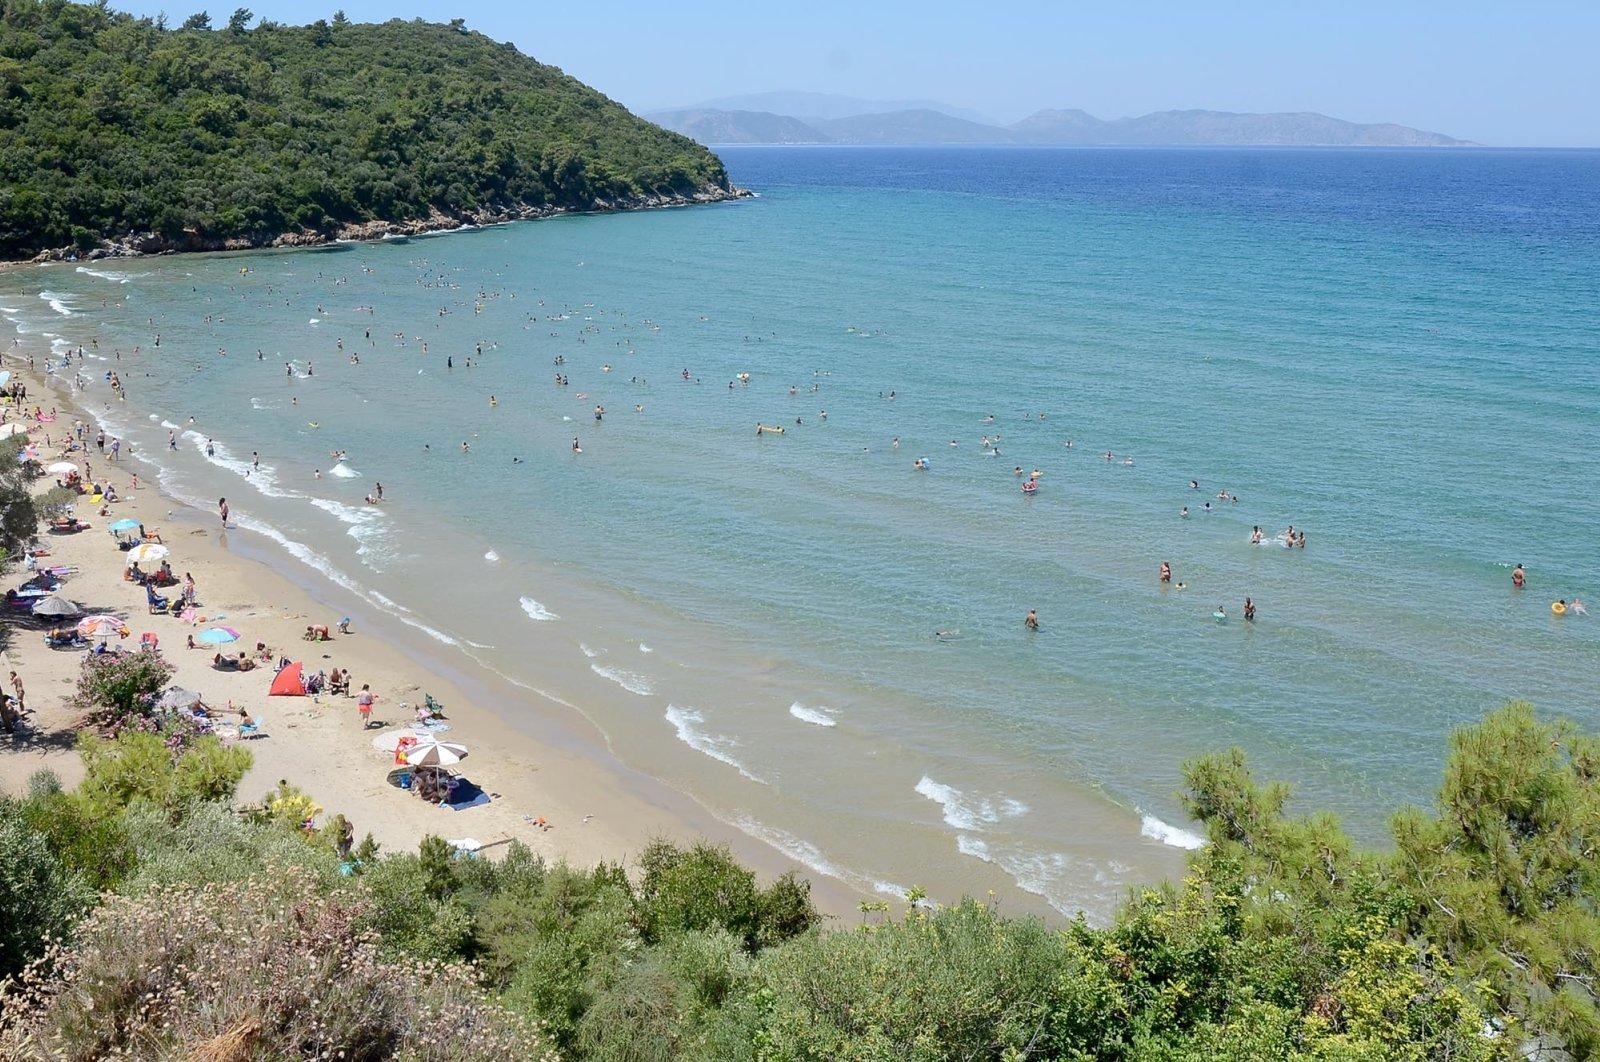 Kuşadası allures diving enthusiasts with its underwater treasures. (DHA Photo)